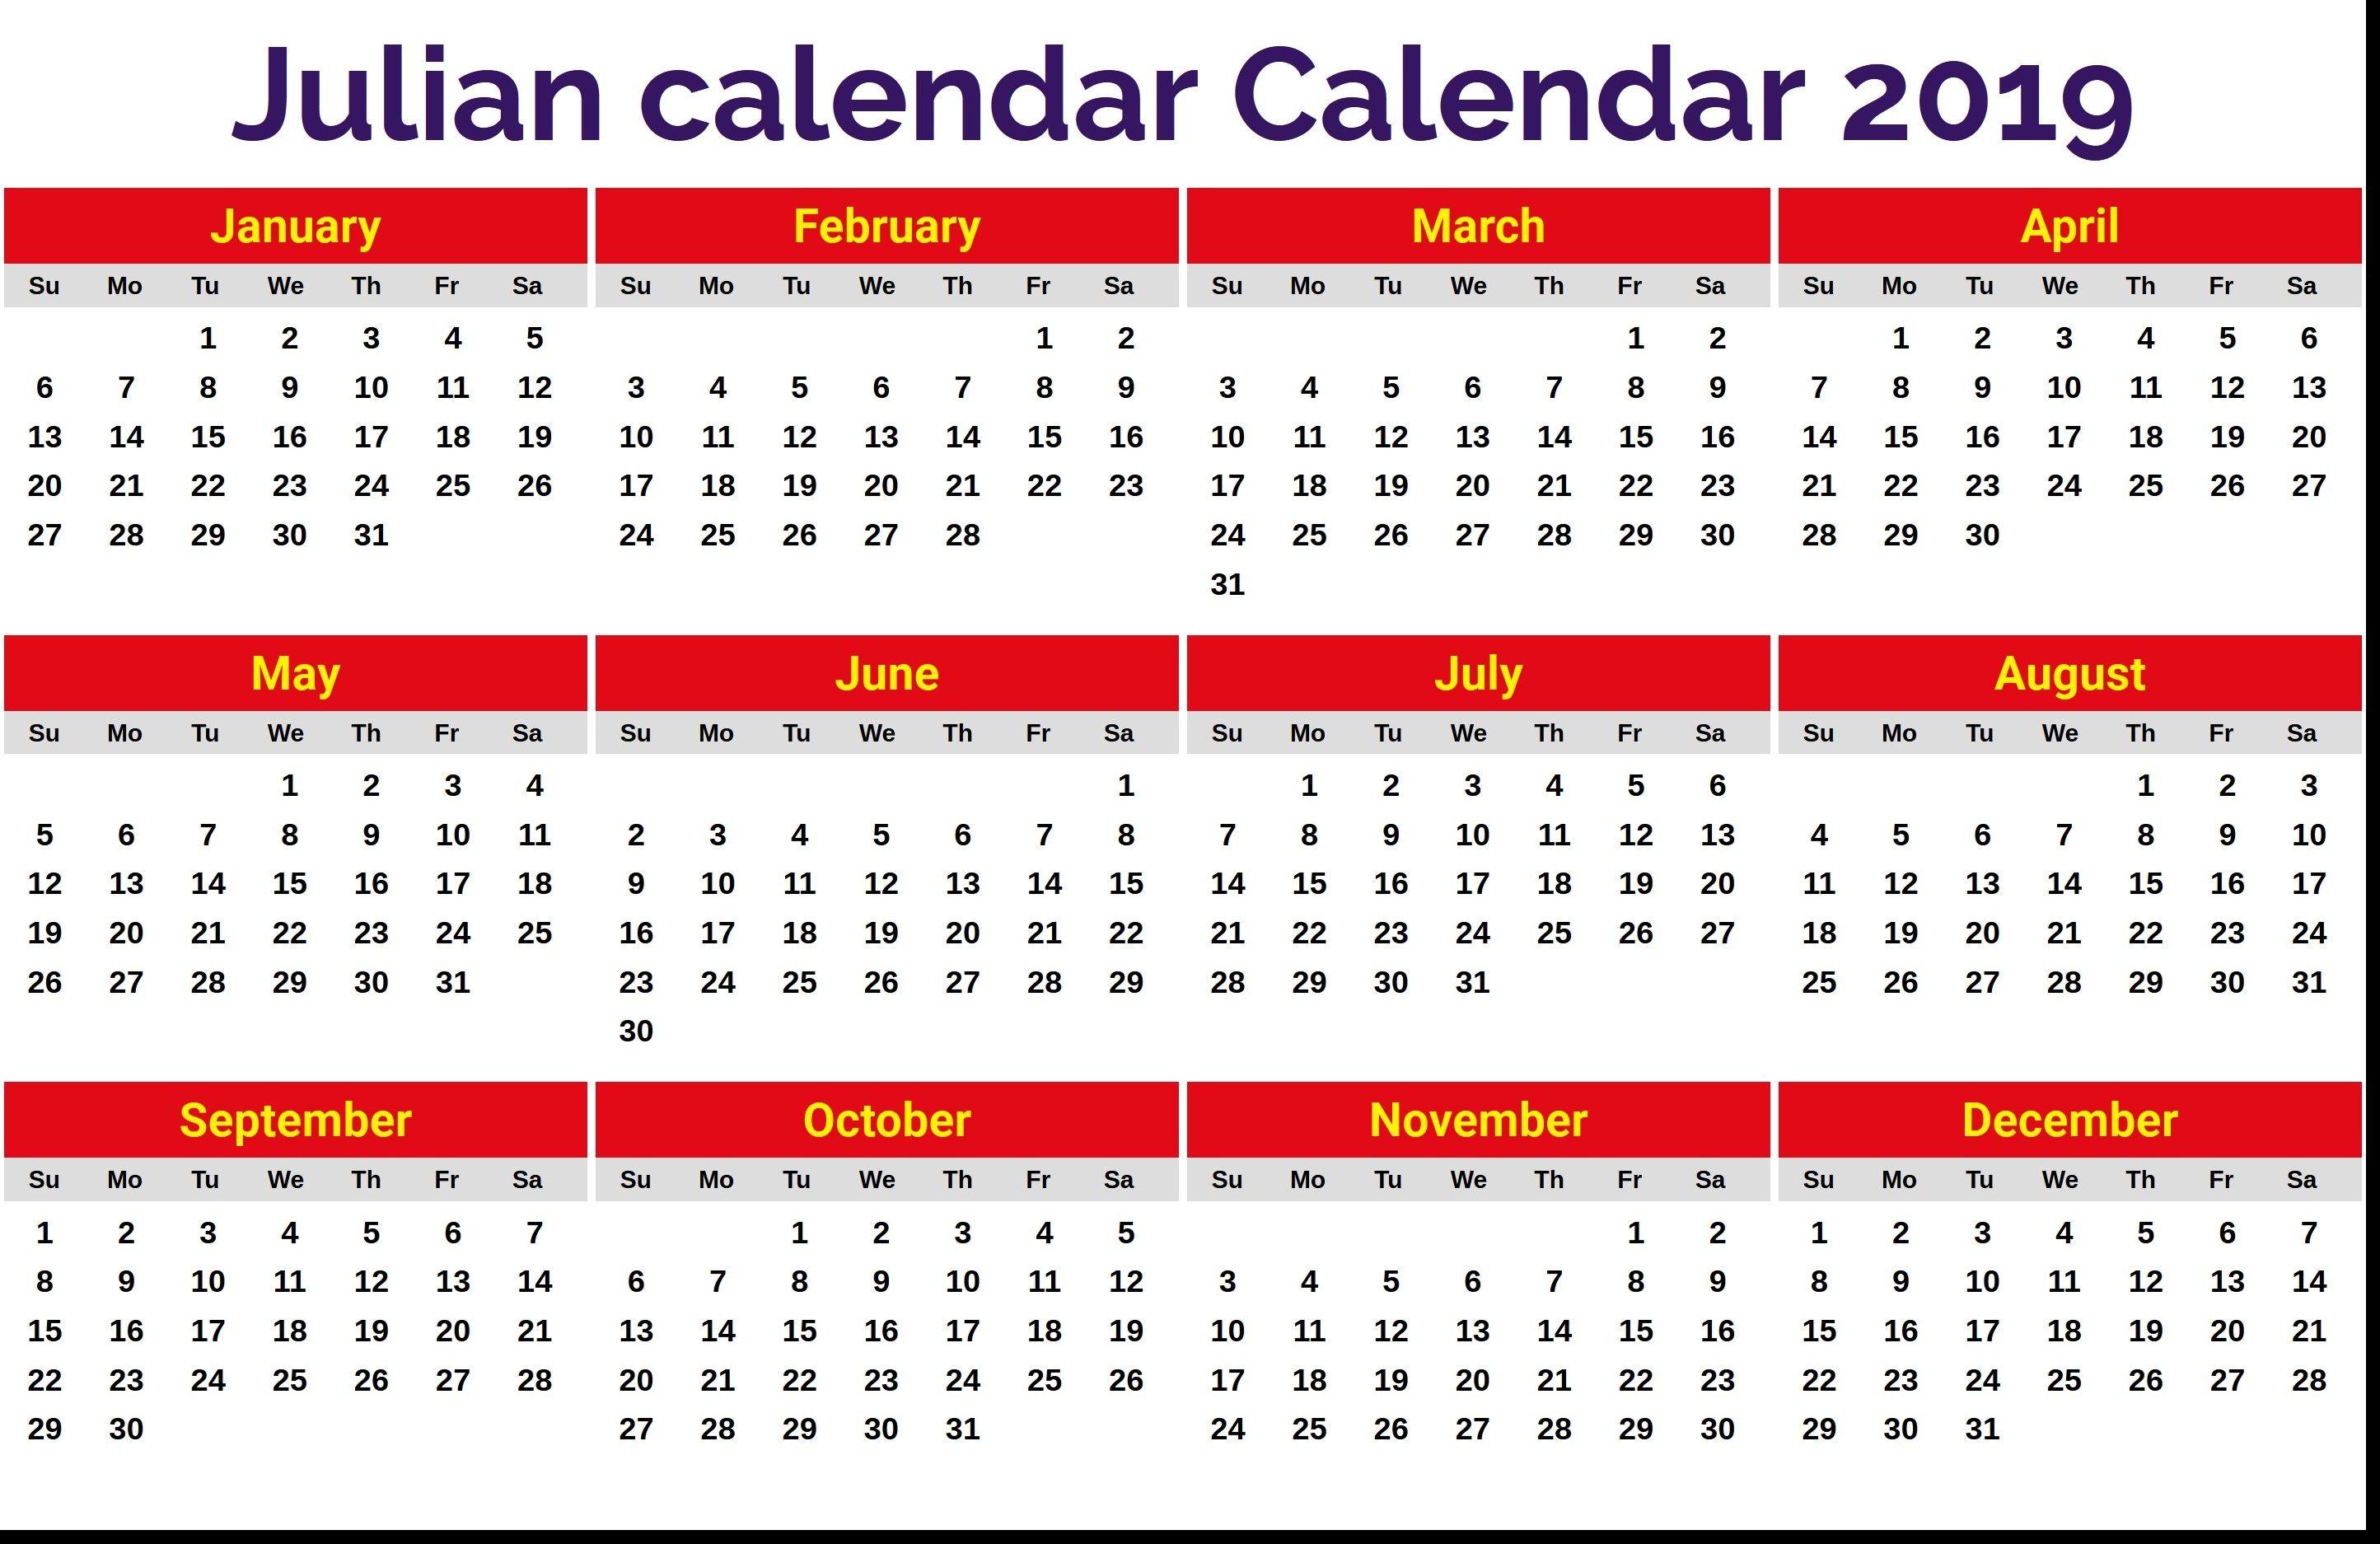 New 2019 Julian Date Calendar Printable Printable Monthly Calendar Get Calendar Printables Calendar Template Monthly Calendar Printable